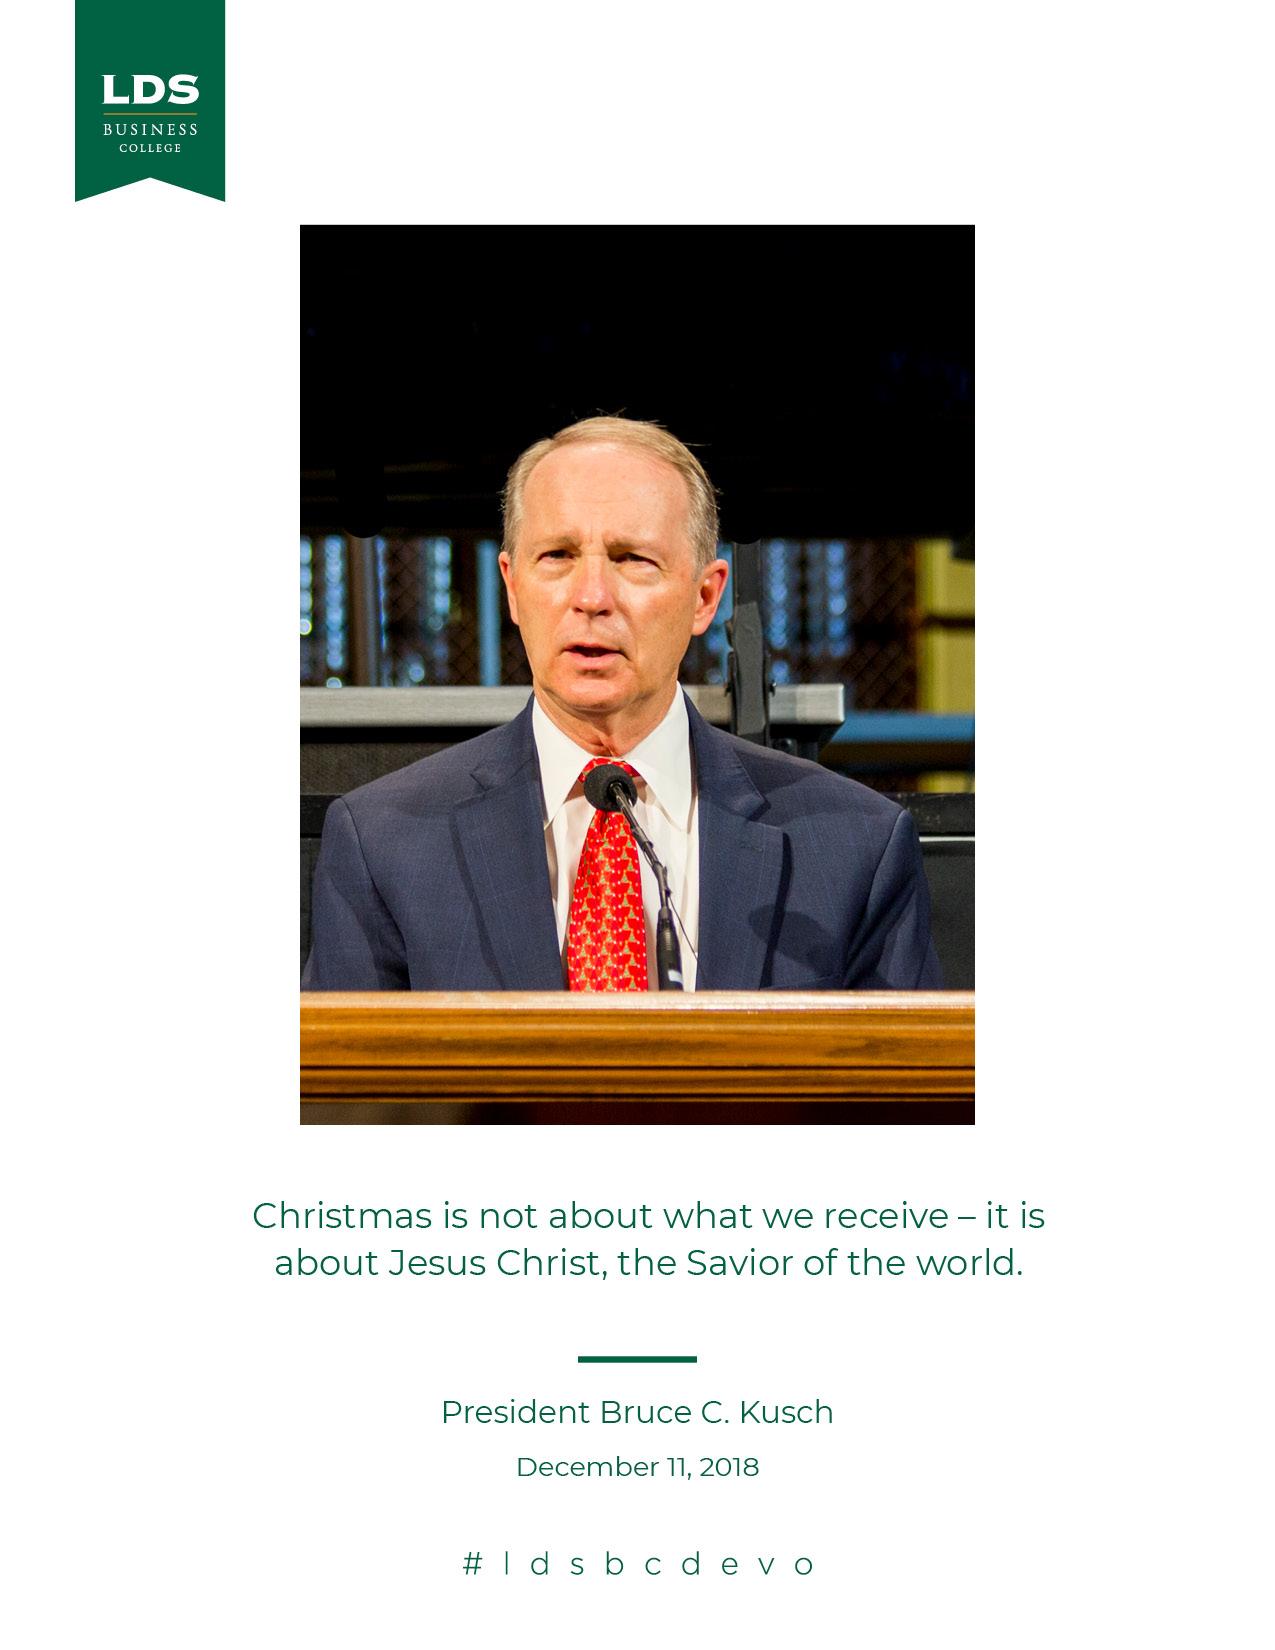 President Kusch quote